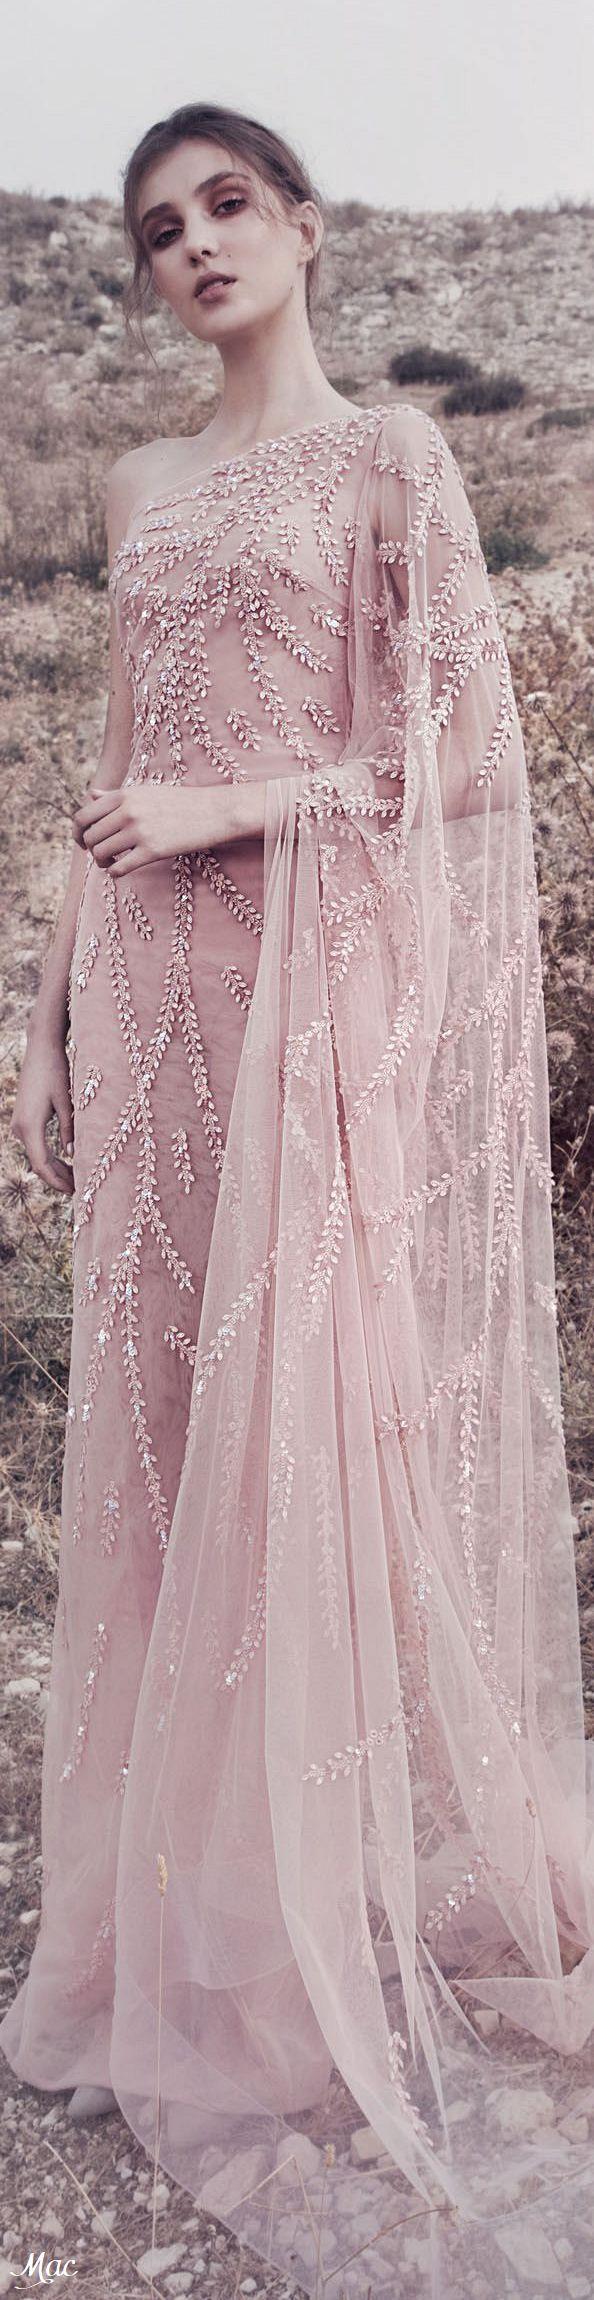 "Fall 2017 Haute Couture Rami Kadi ""Zephyr"" Collection"